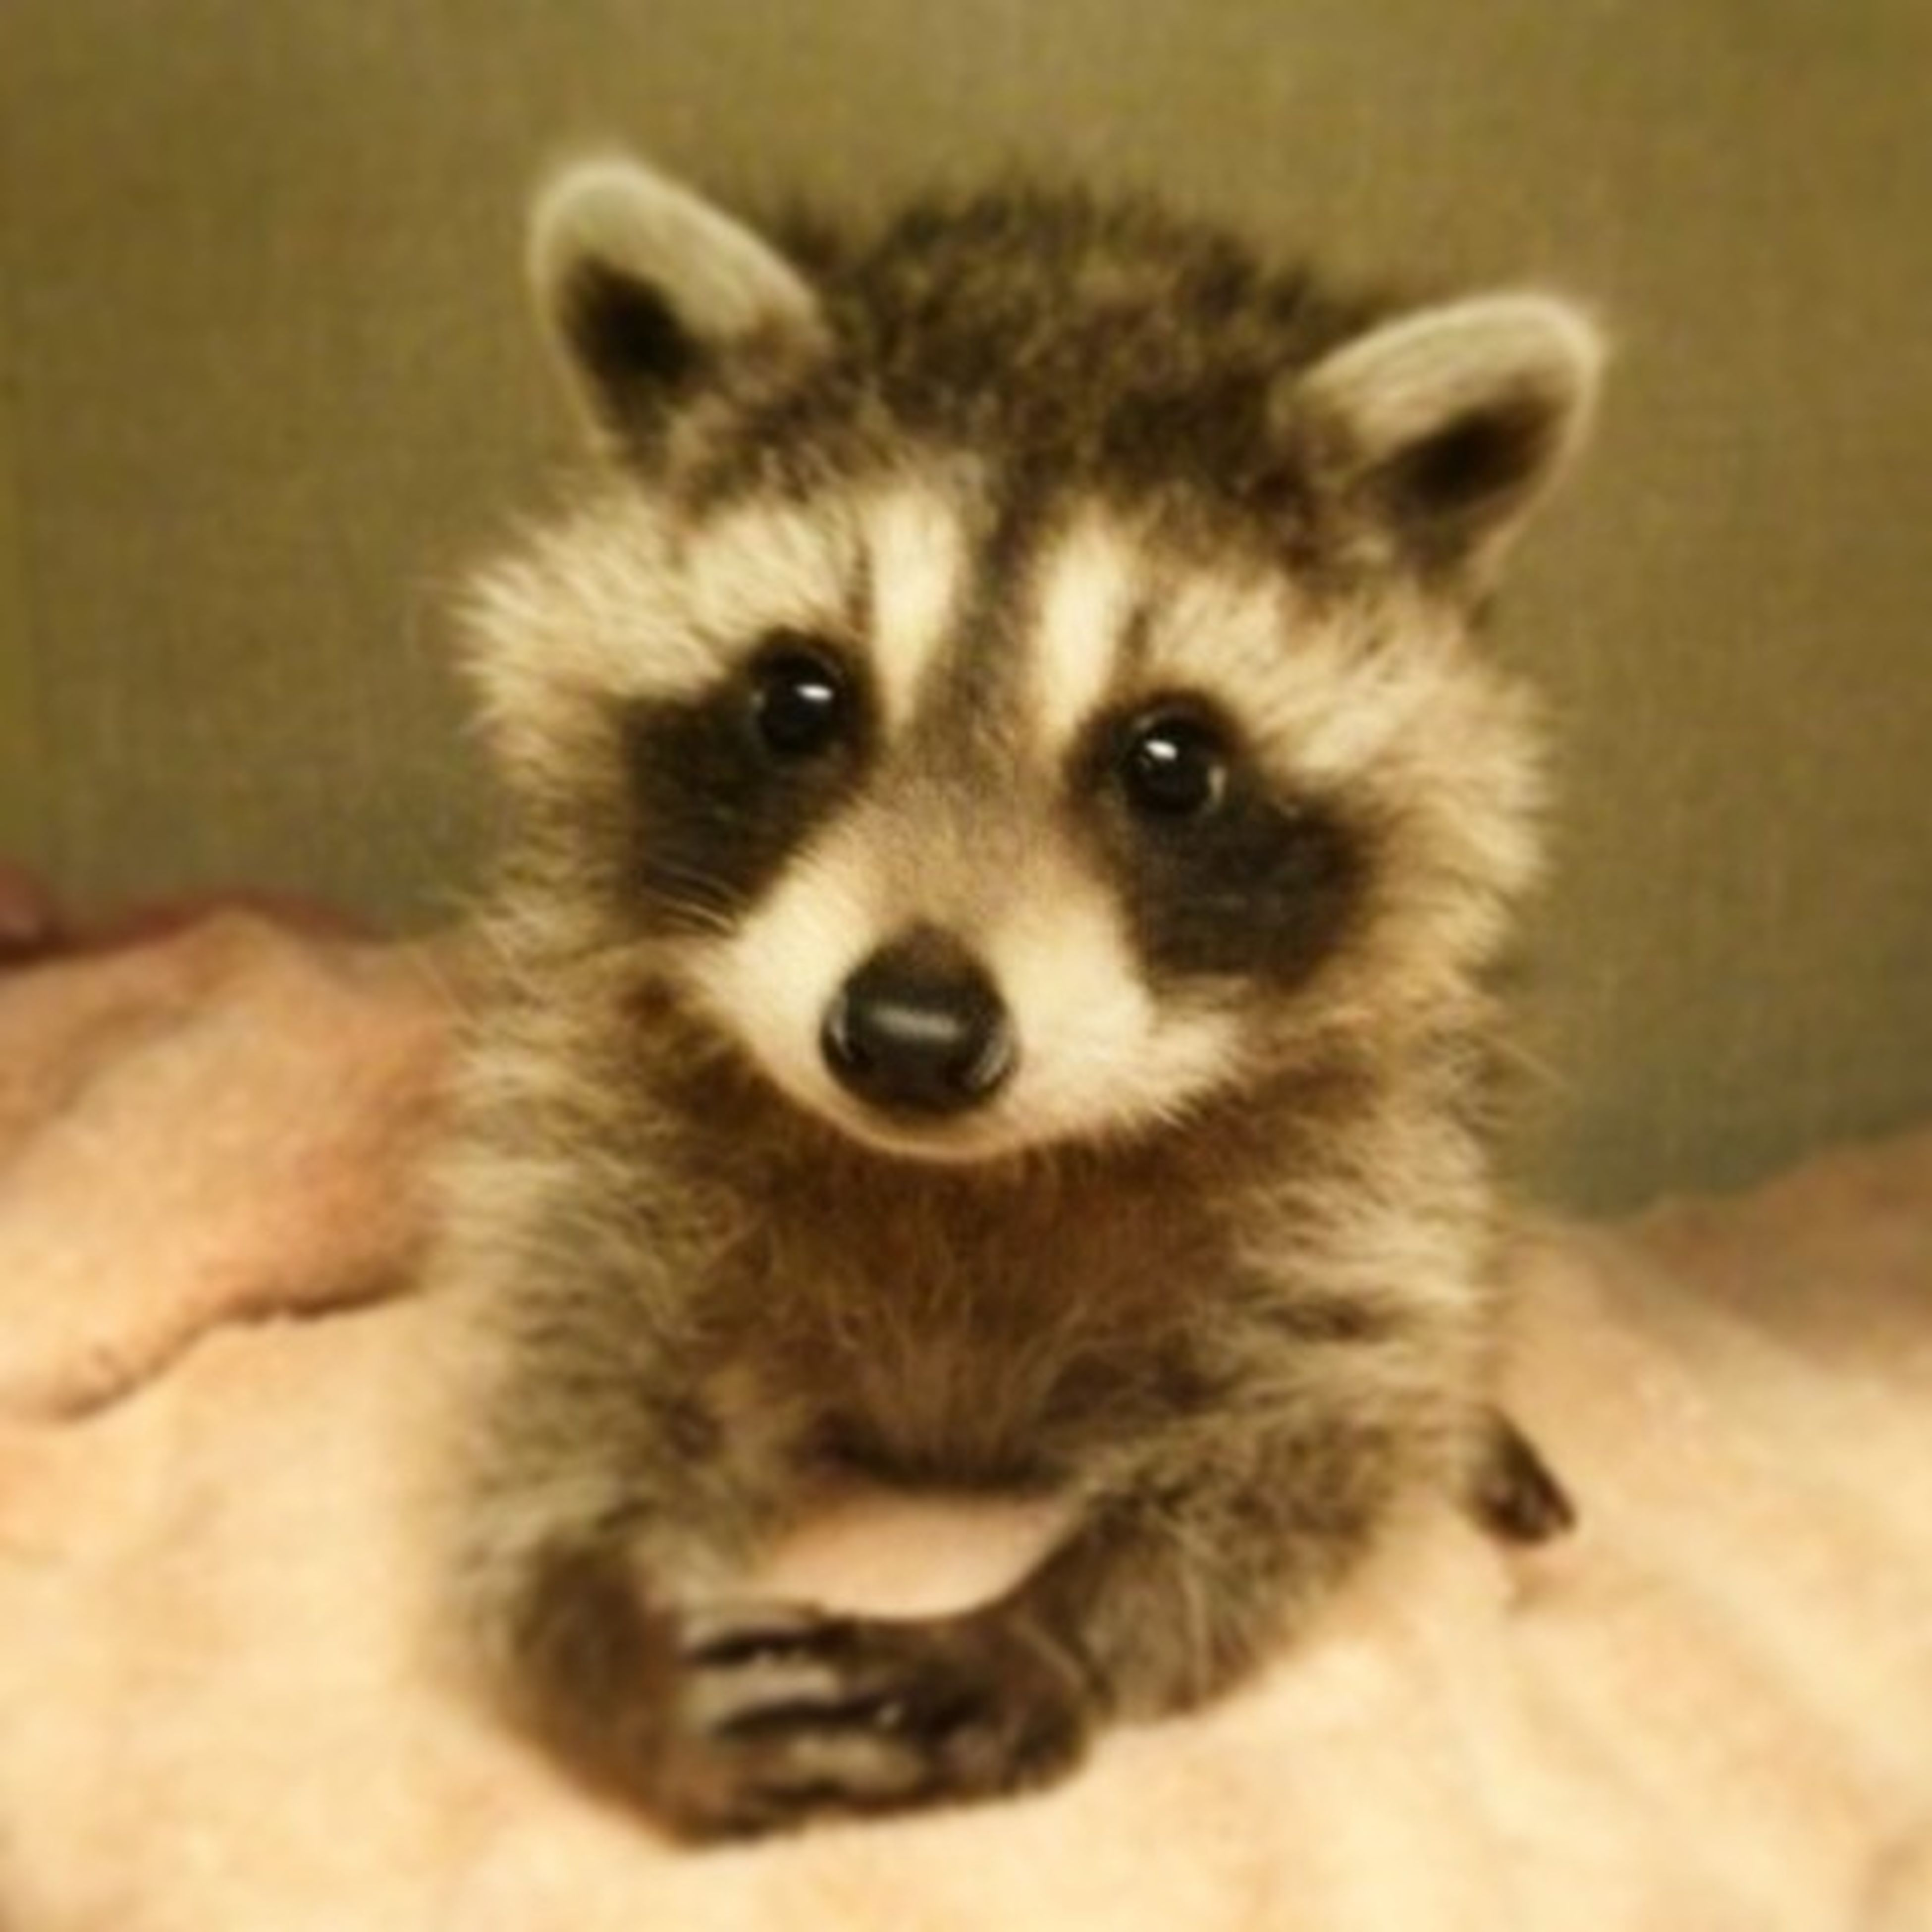 Raccoon Szop Słodki Chce TBT  Instagood Animal